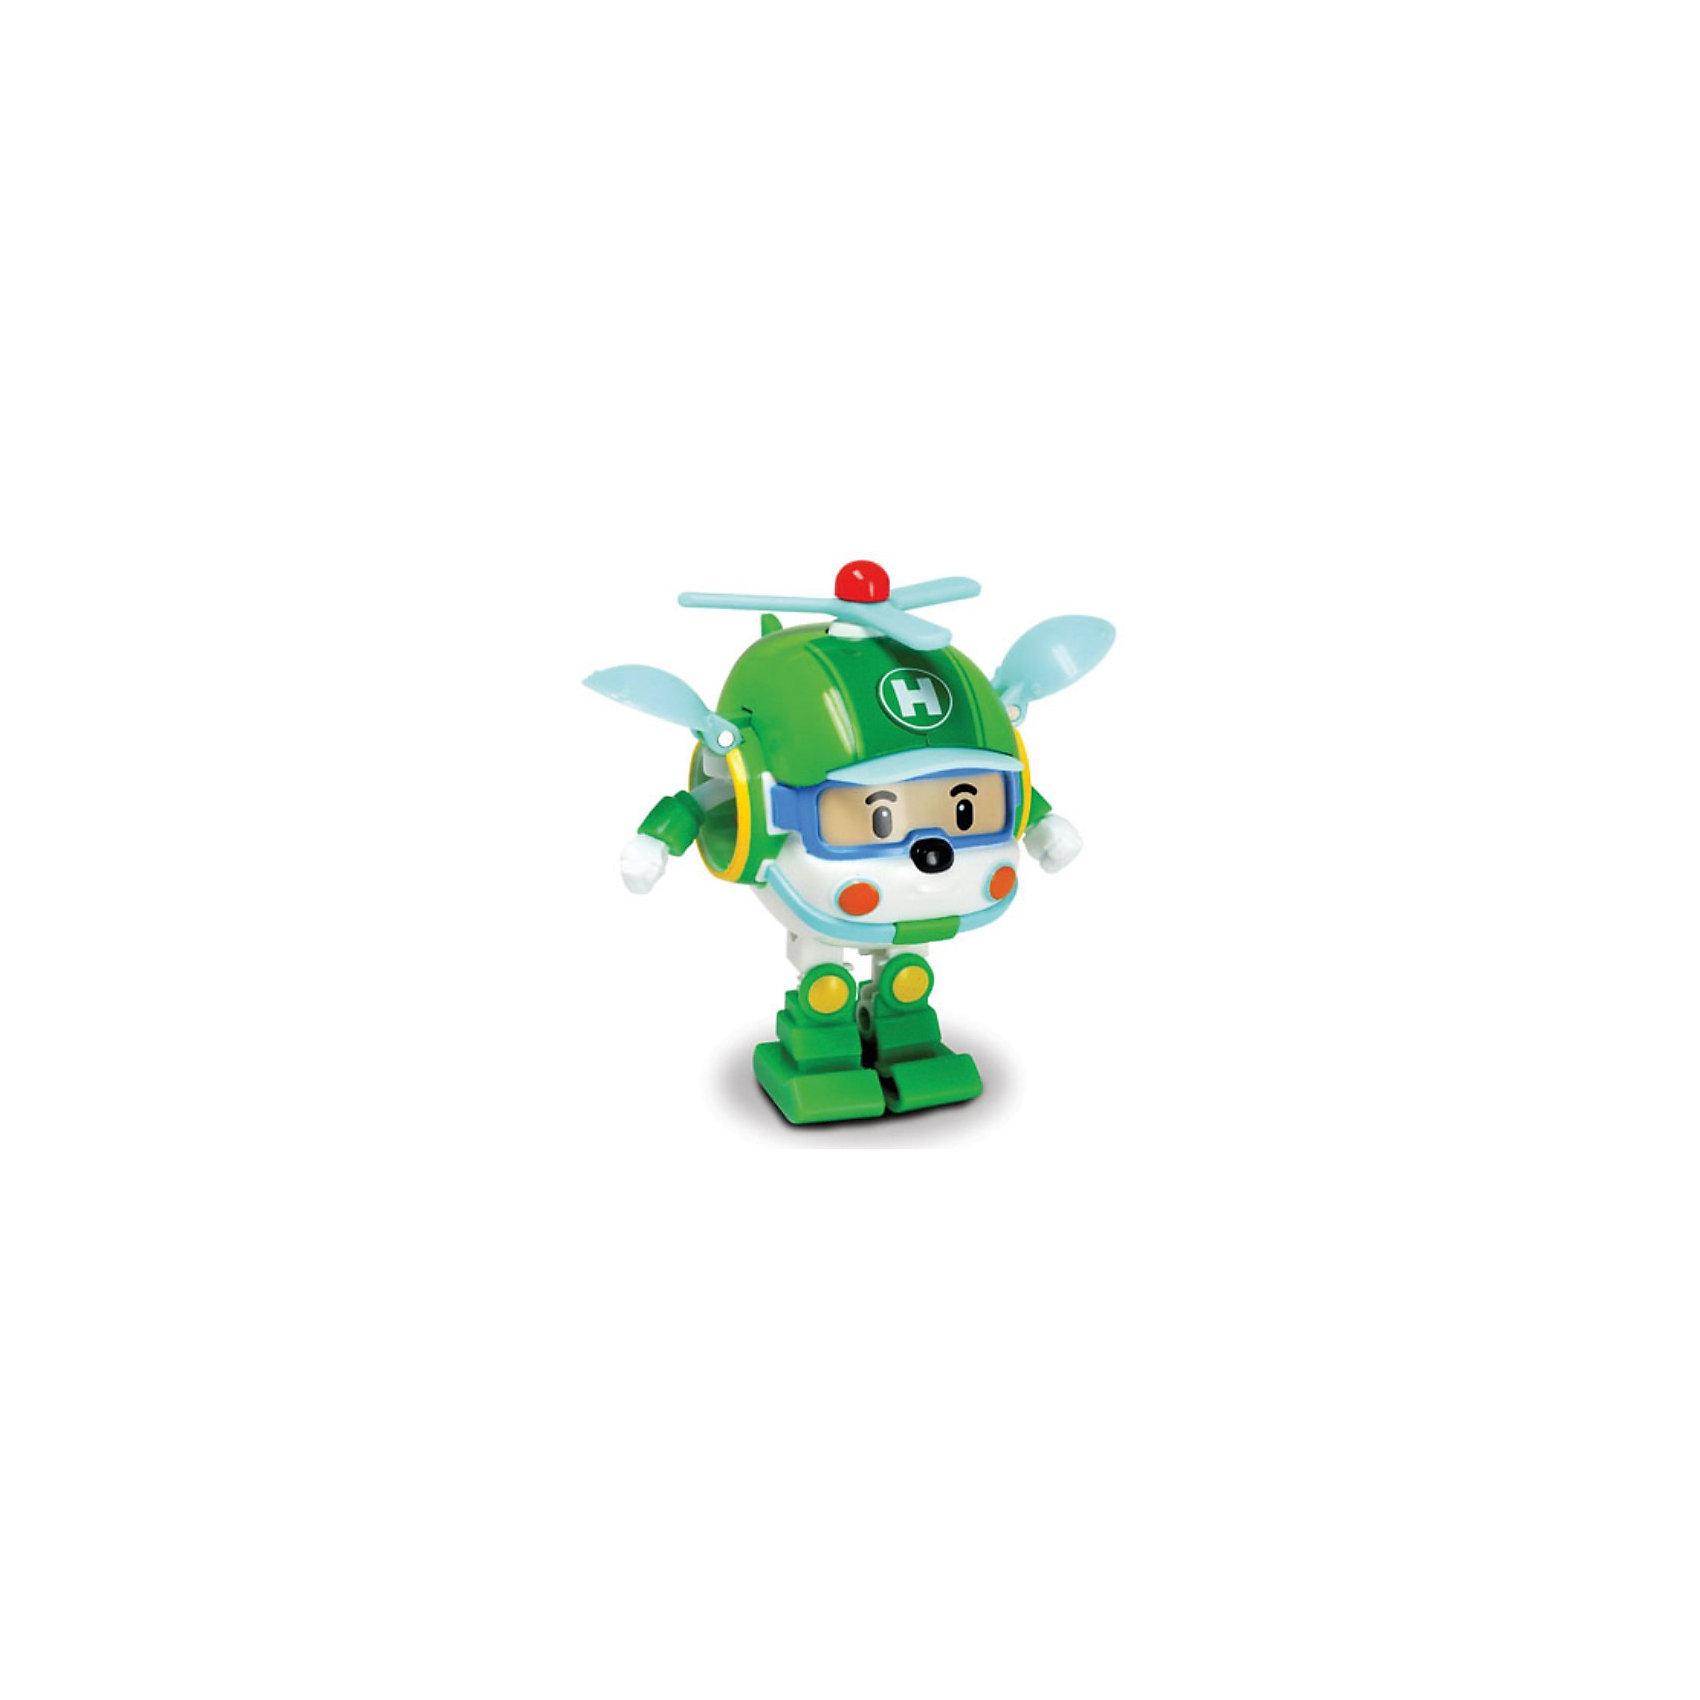 Silverlit Игрушка Хэли трансформер, 7,5 см,  Робокар Поли